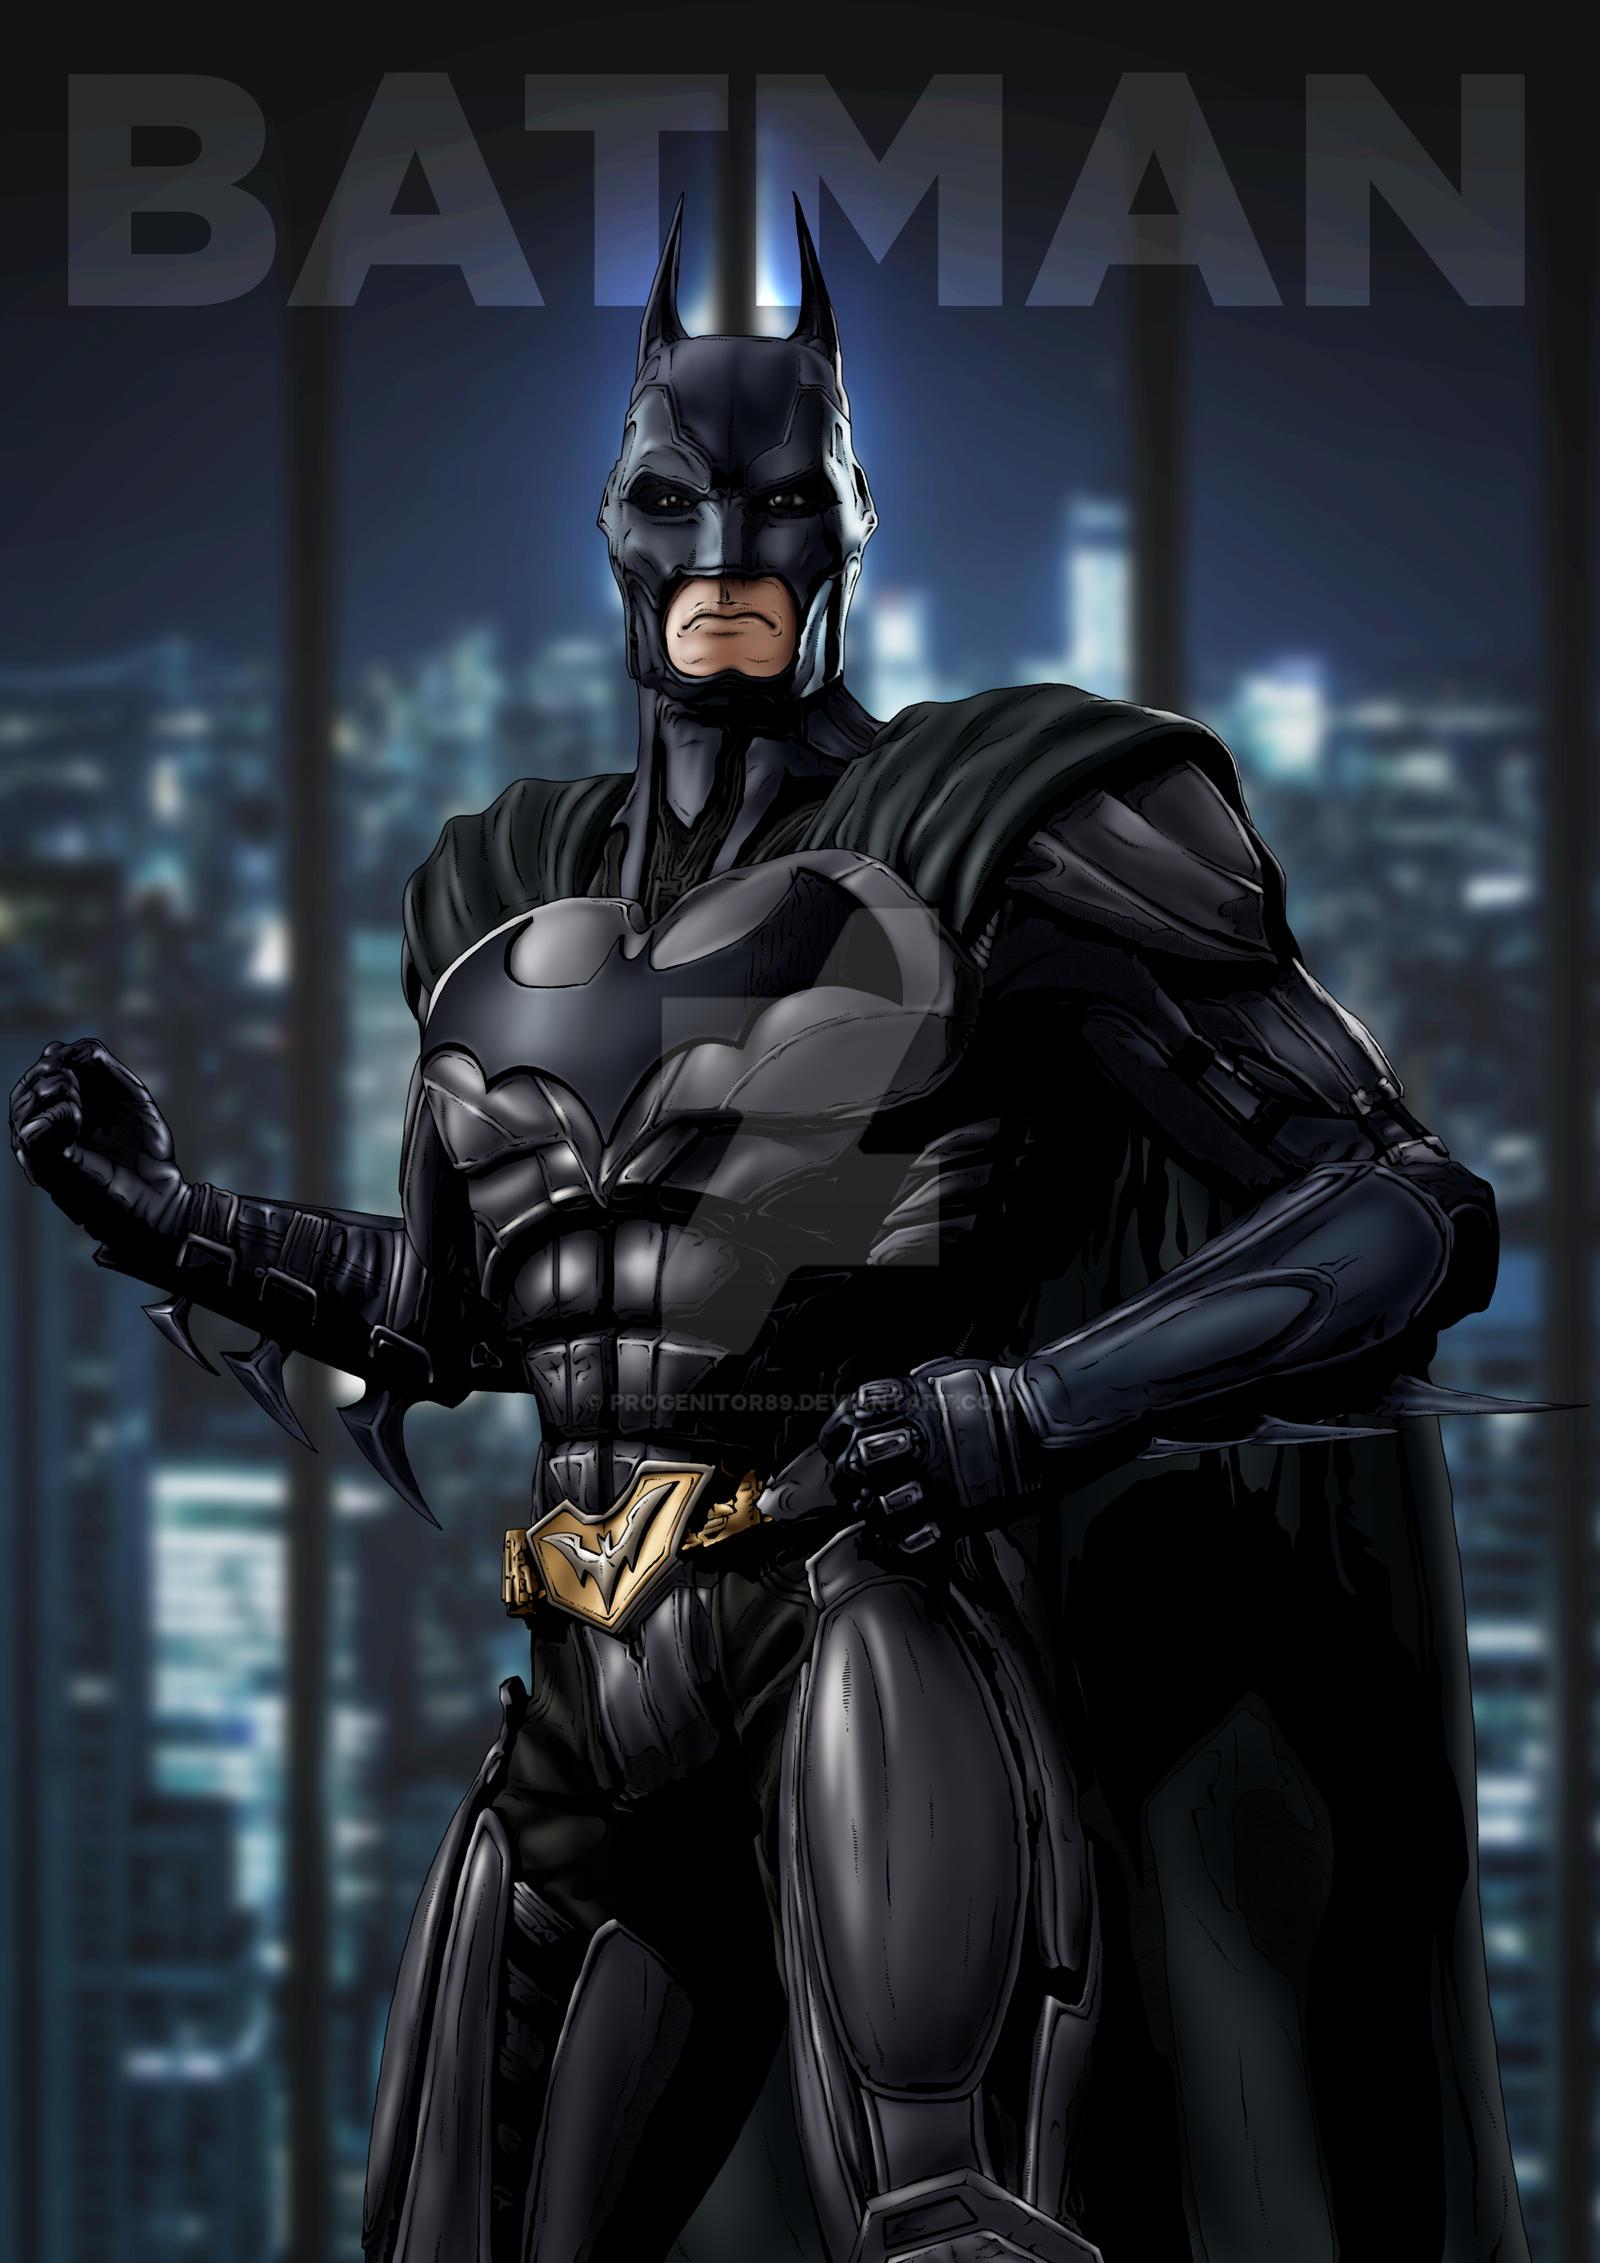 Injustice Batman By Progenitor89